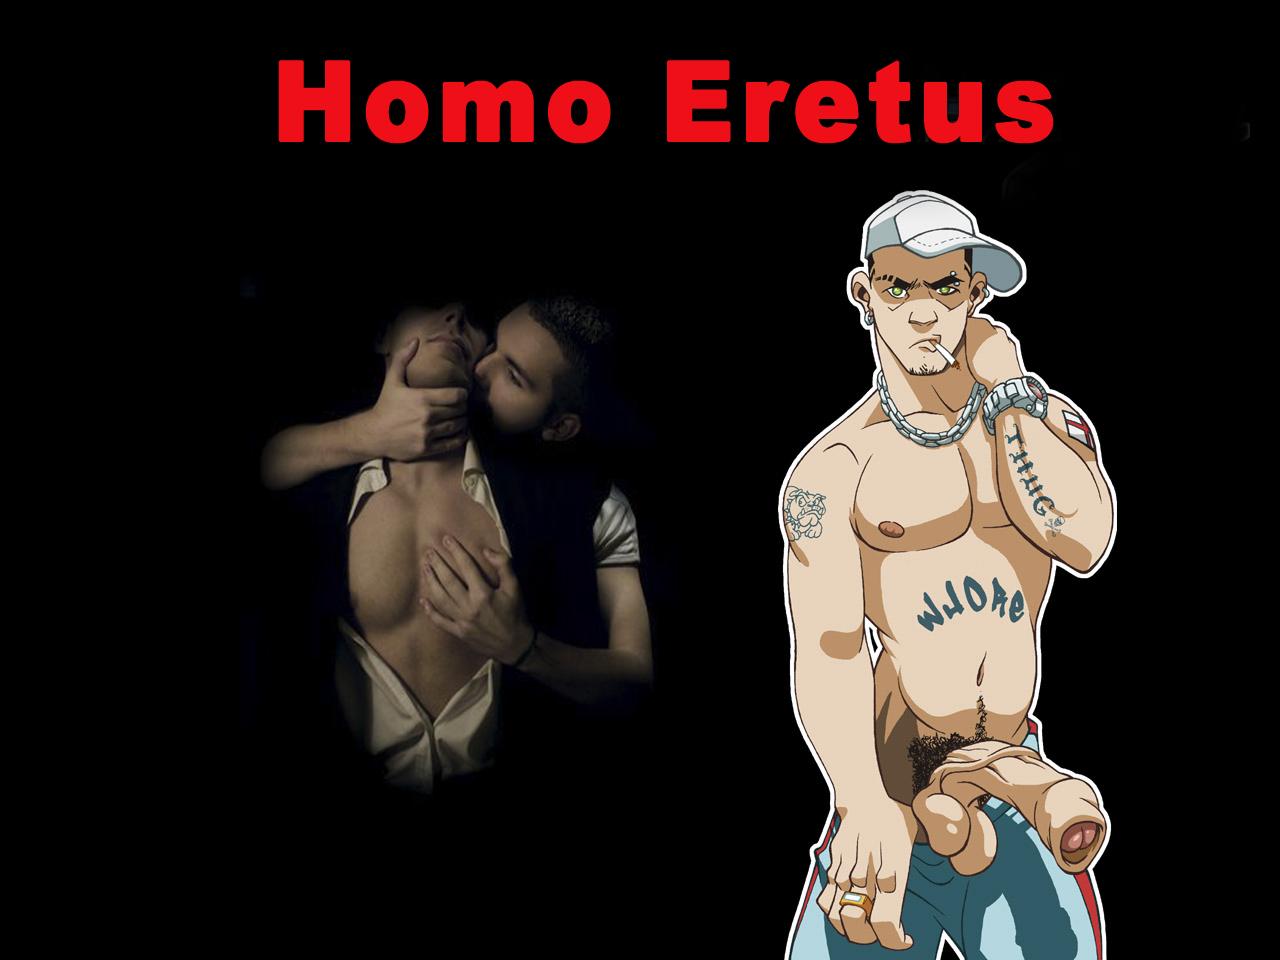 Homo Eretus